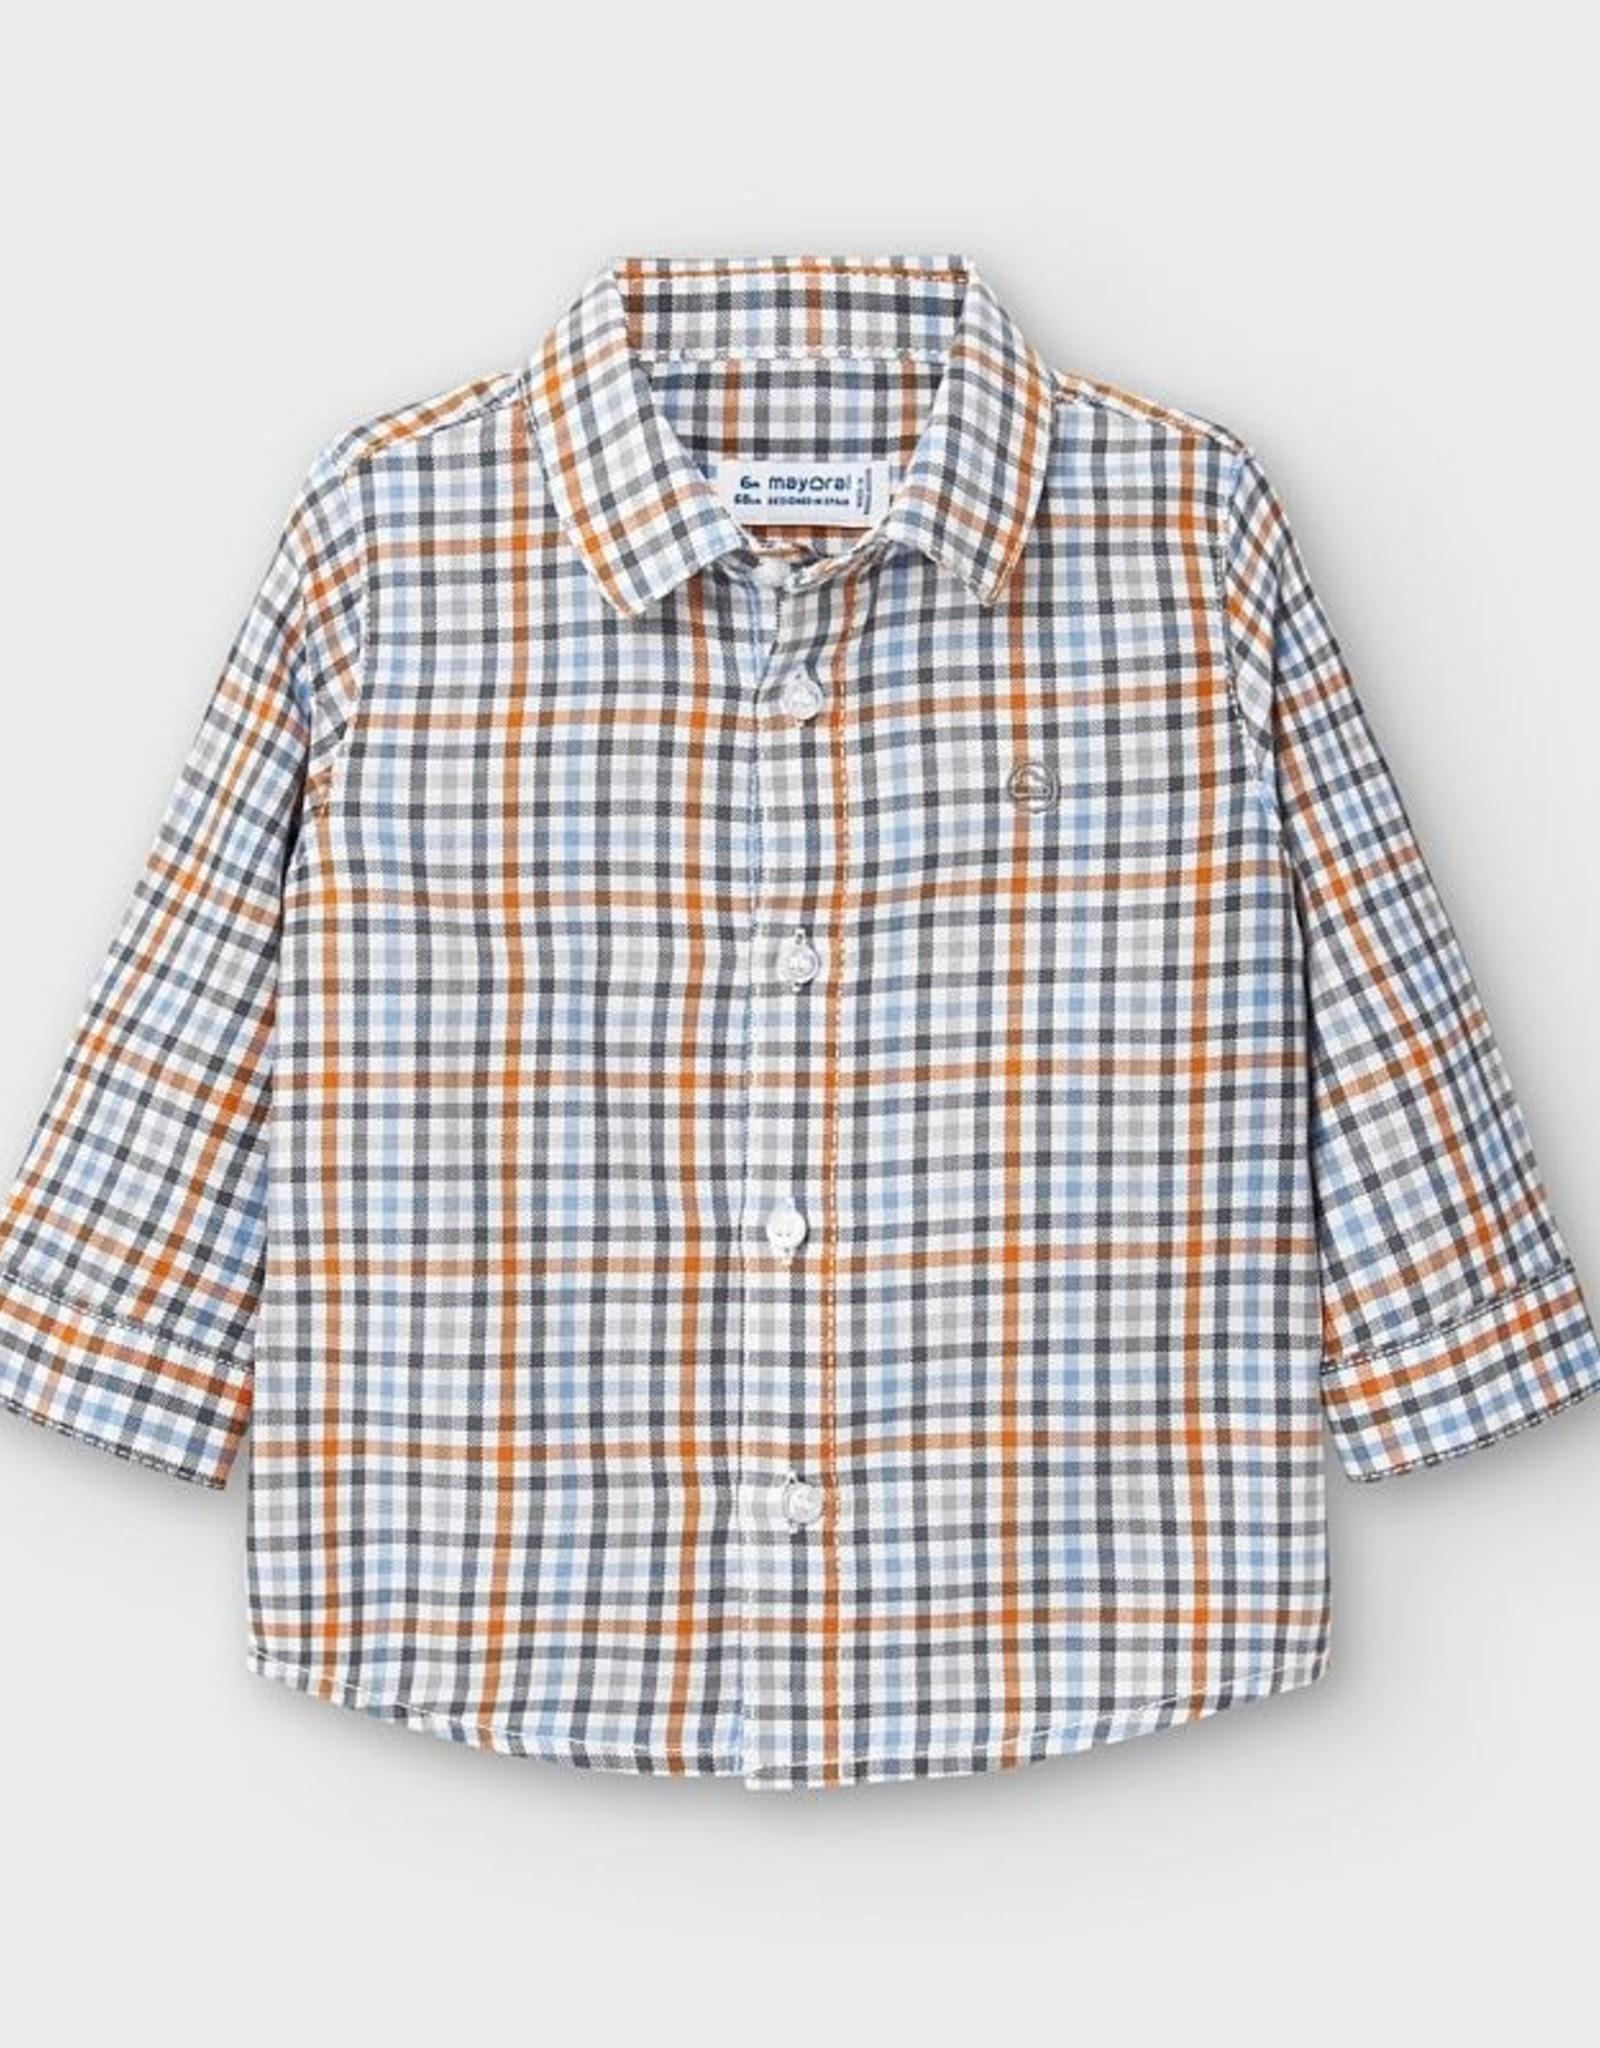 Mayoral Floyd Check Shirt